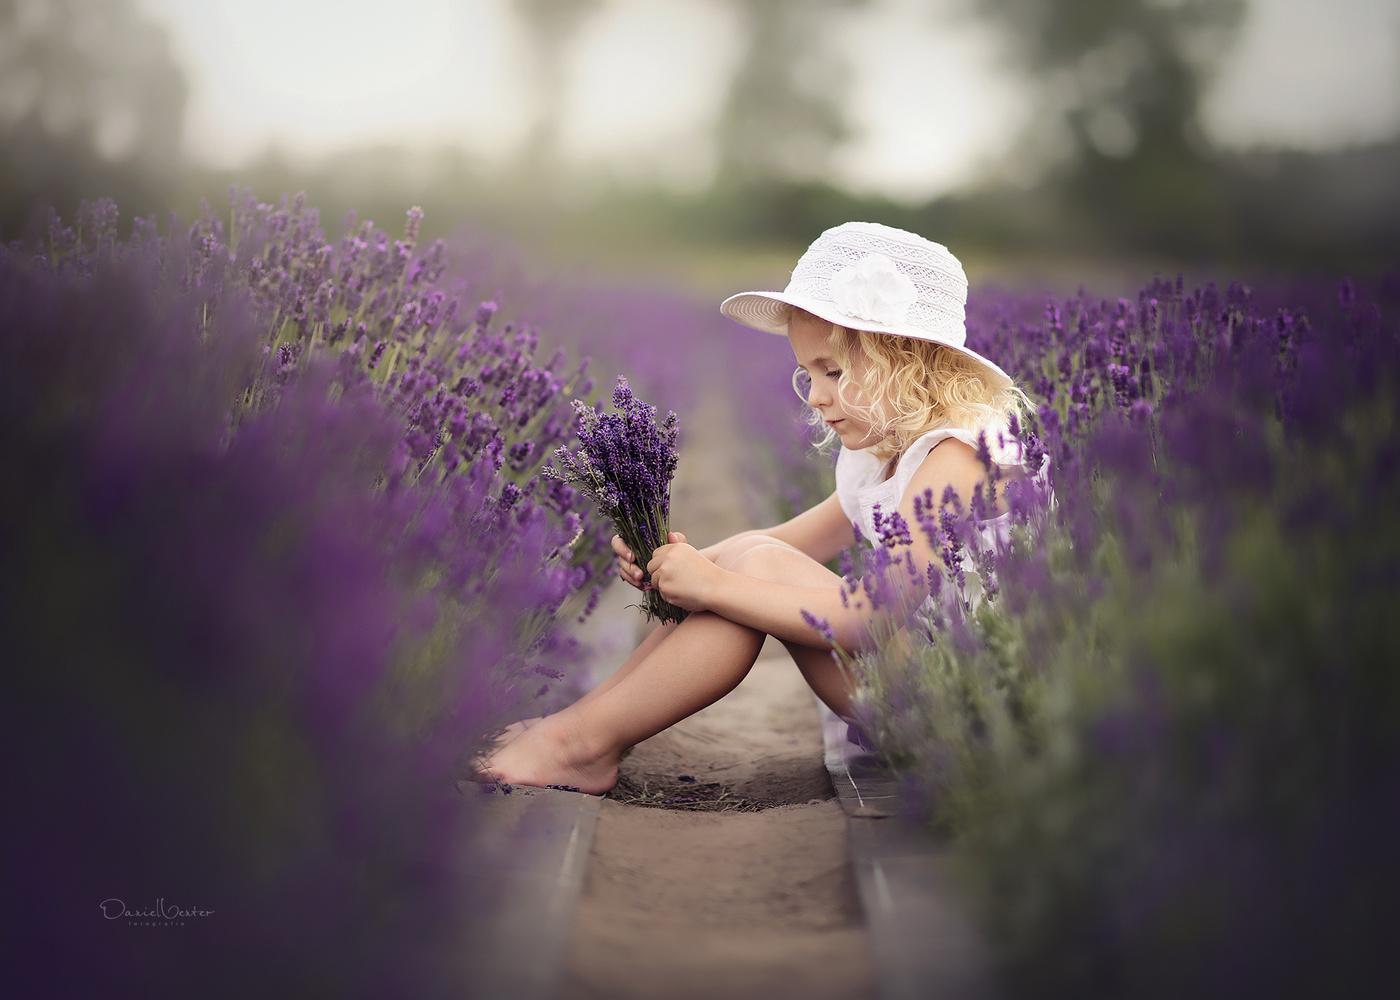 Lavender Dreams by Daniel Venter